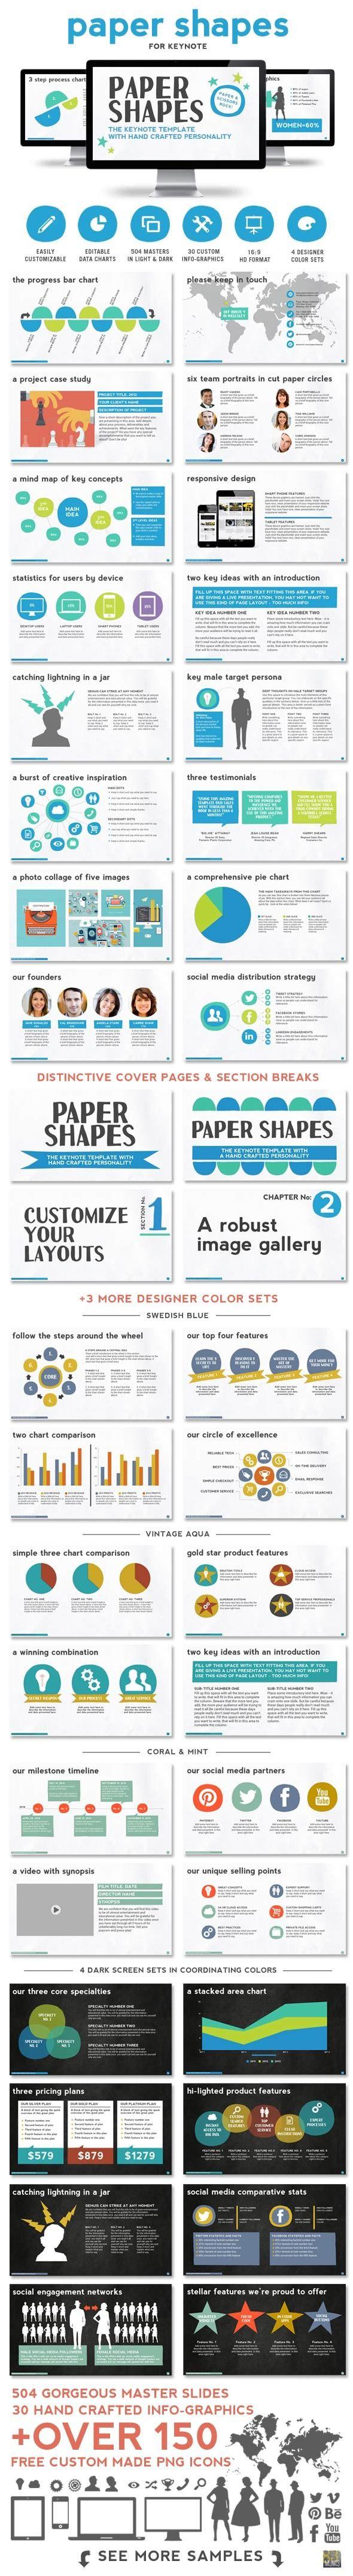 Paper Shapes Keynote Presentation Template - Creative Keynote Templates